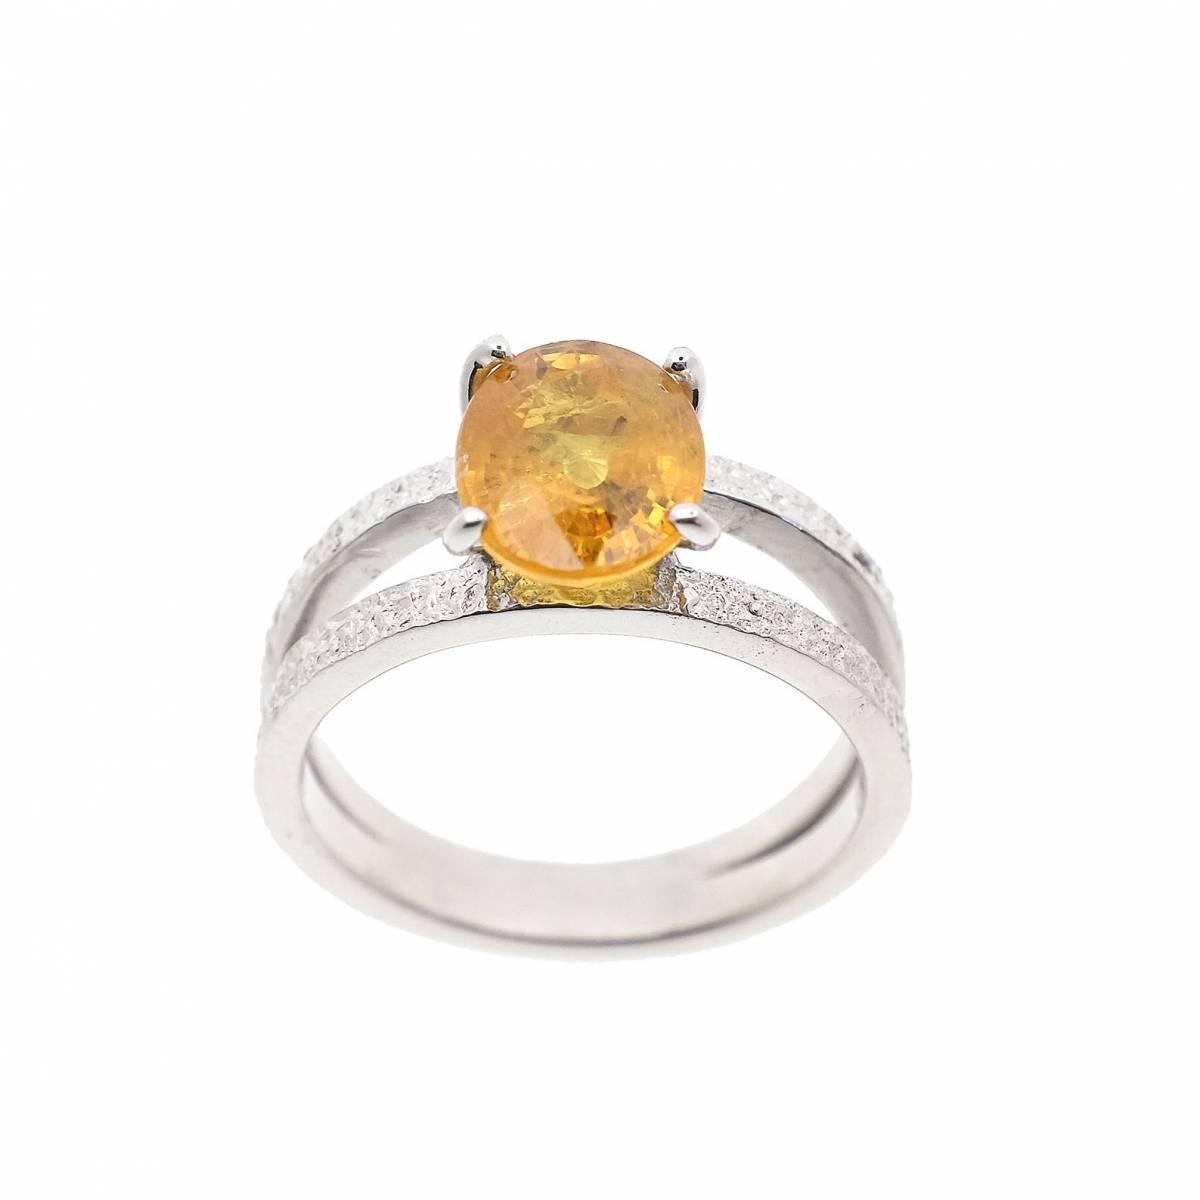 Jonas Maes Jewels - Juwelen - Bruidsjuwelen - Verlovingsring - Trouwring - House of Weddings - 24